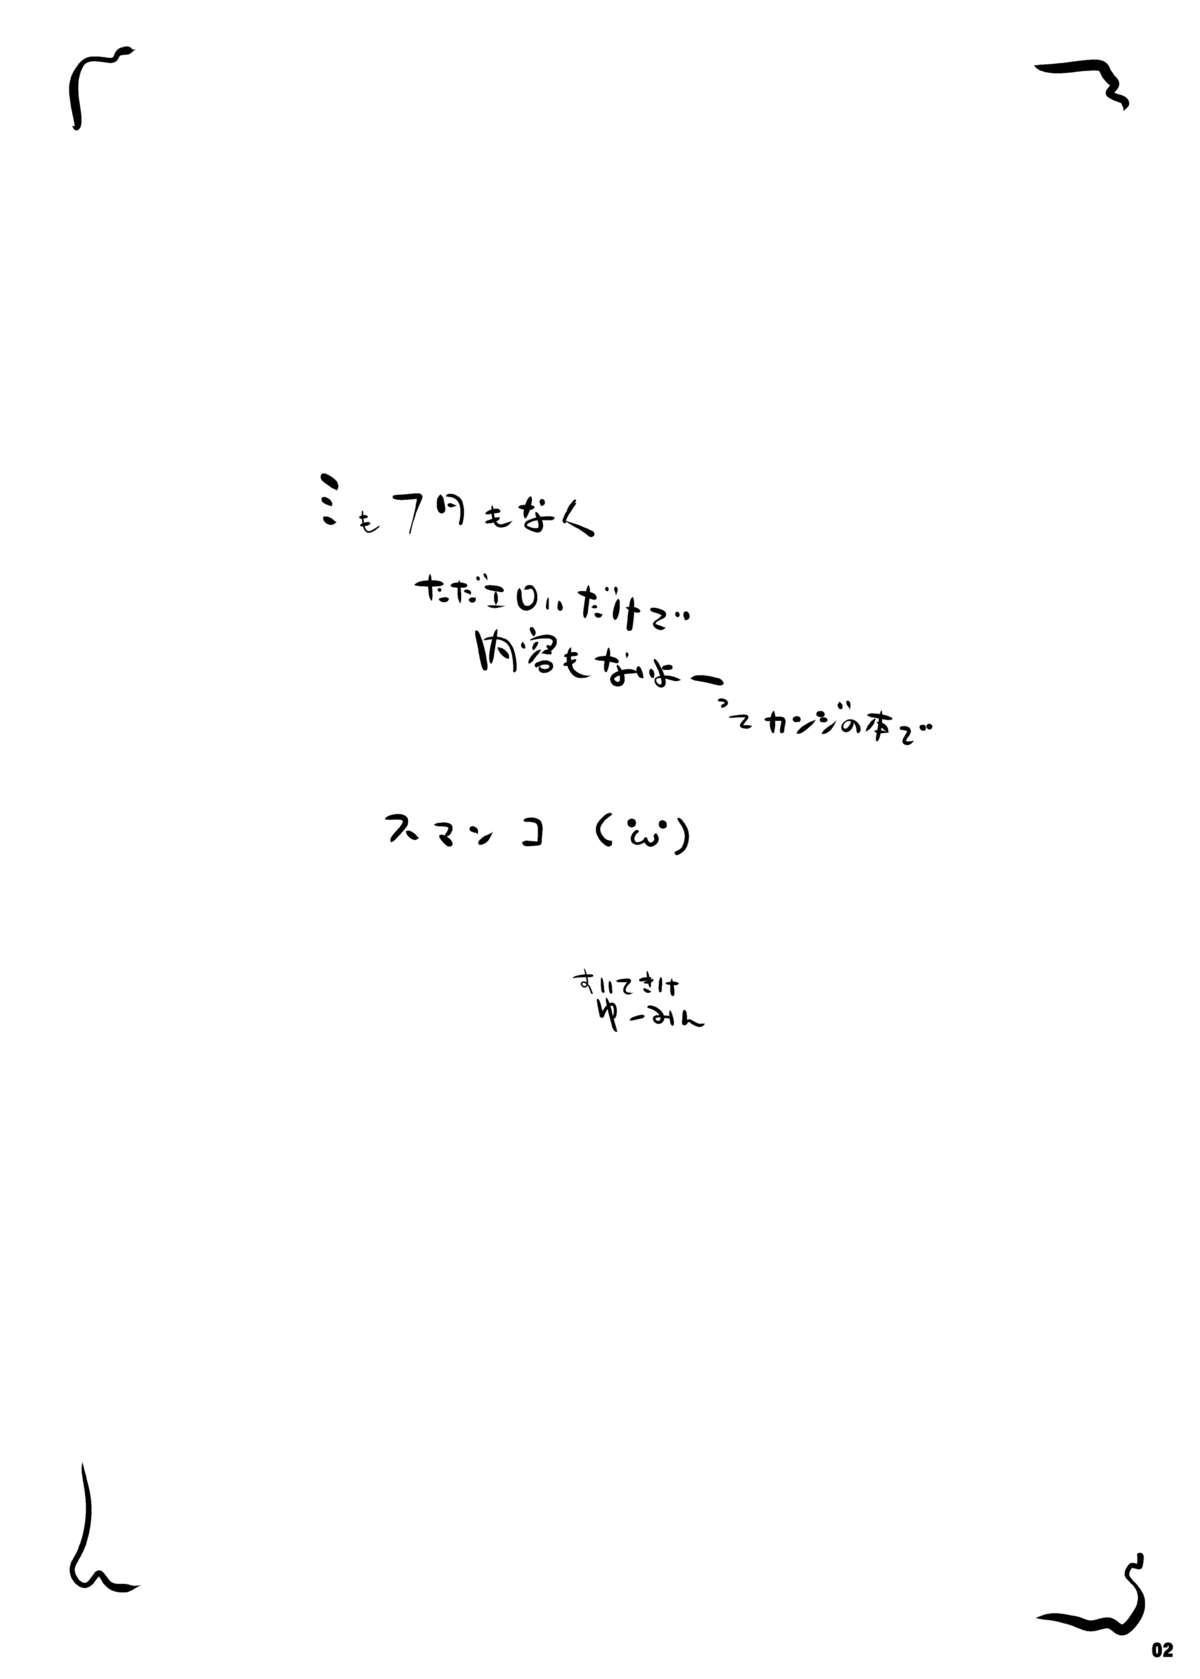 [Suitekiya (Suiteki-ka Yū-min)]Kennai Mating Scandal (1: Einclad / 2: Fairy Dance) SAO The Complete (Sword Art Online) 1